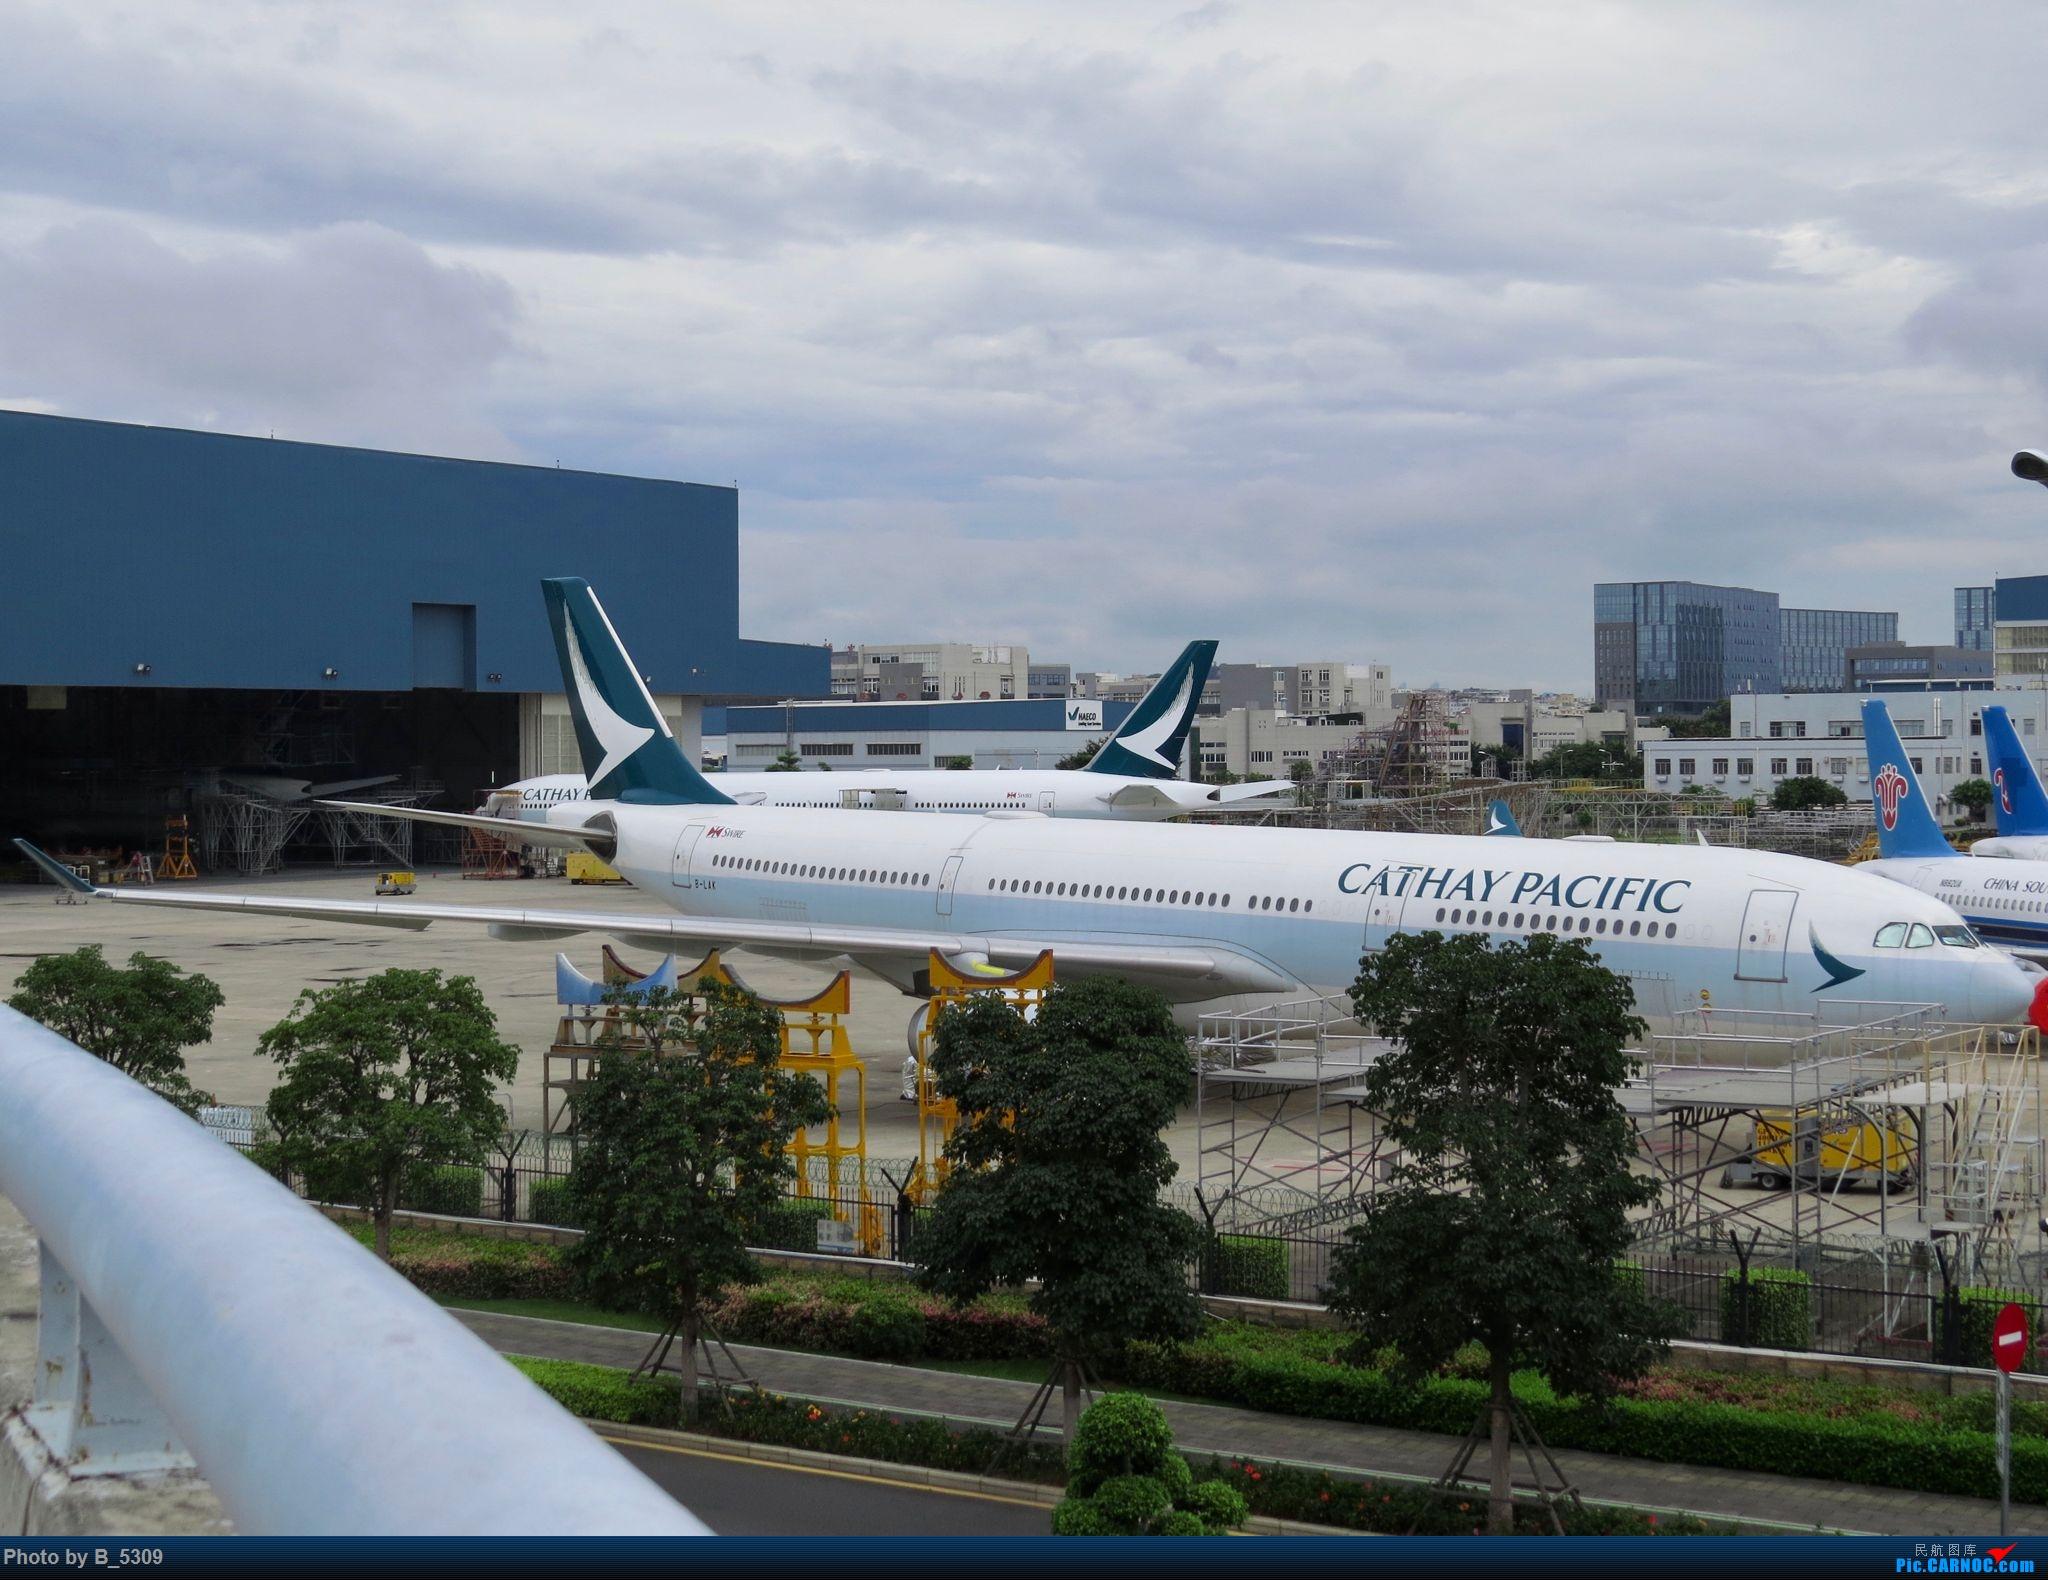 Re:[原创]复课一个月了,终于能在紧张的学习生活中抽出点时间拍稽~ AIRBUS A330-300 B-LAK 中国厦门高崎国际机场